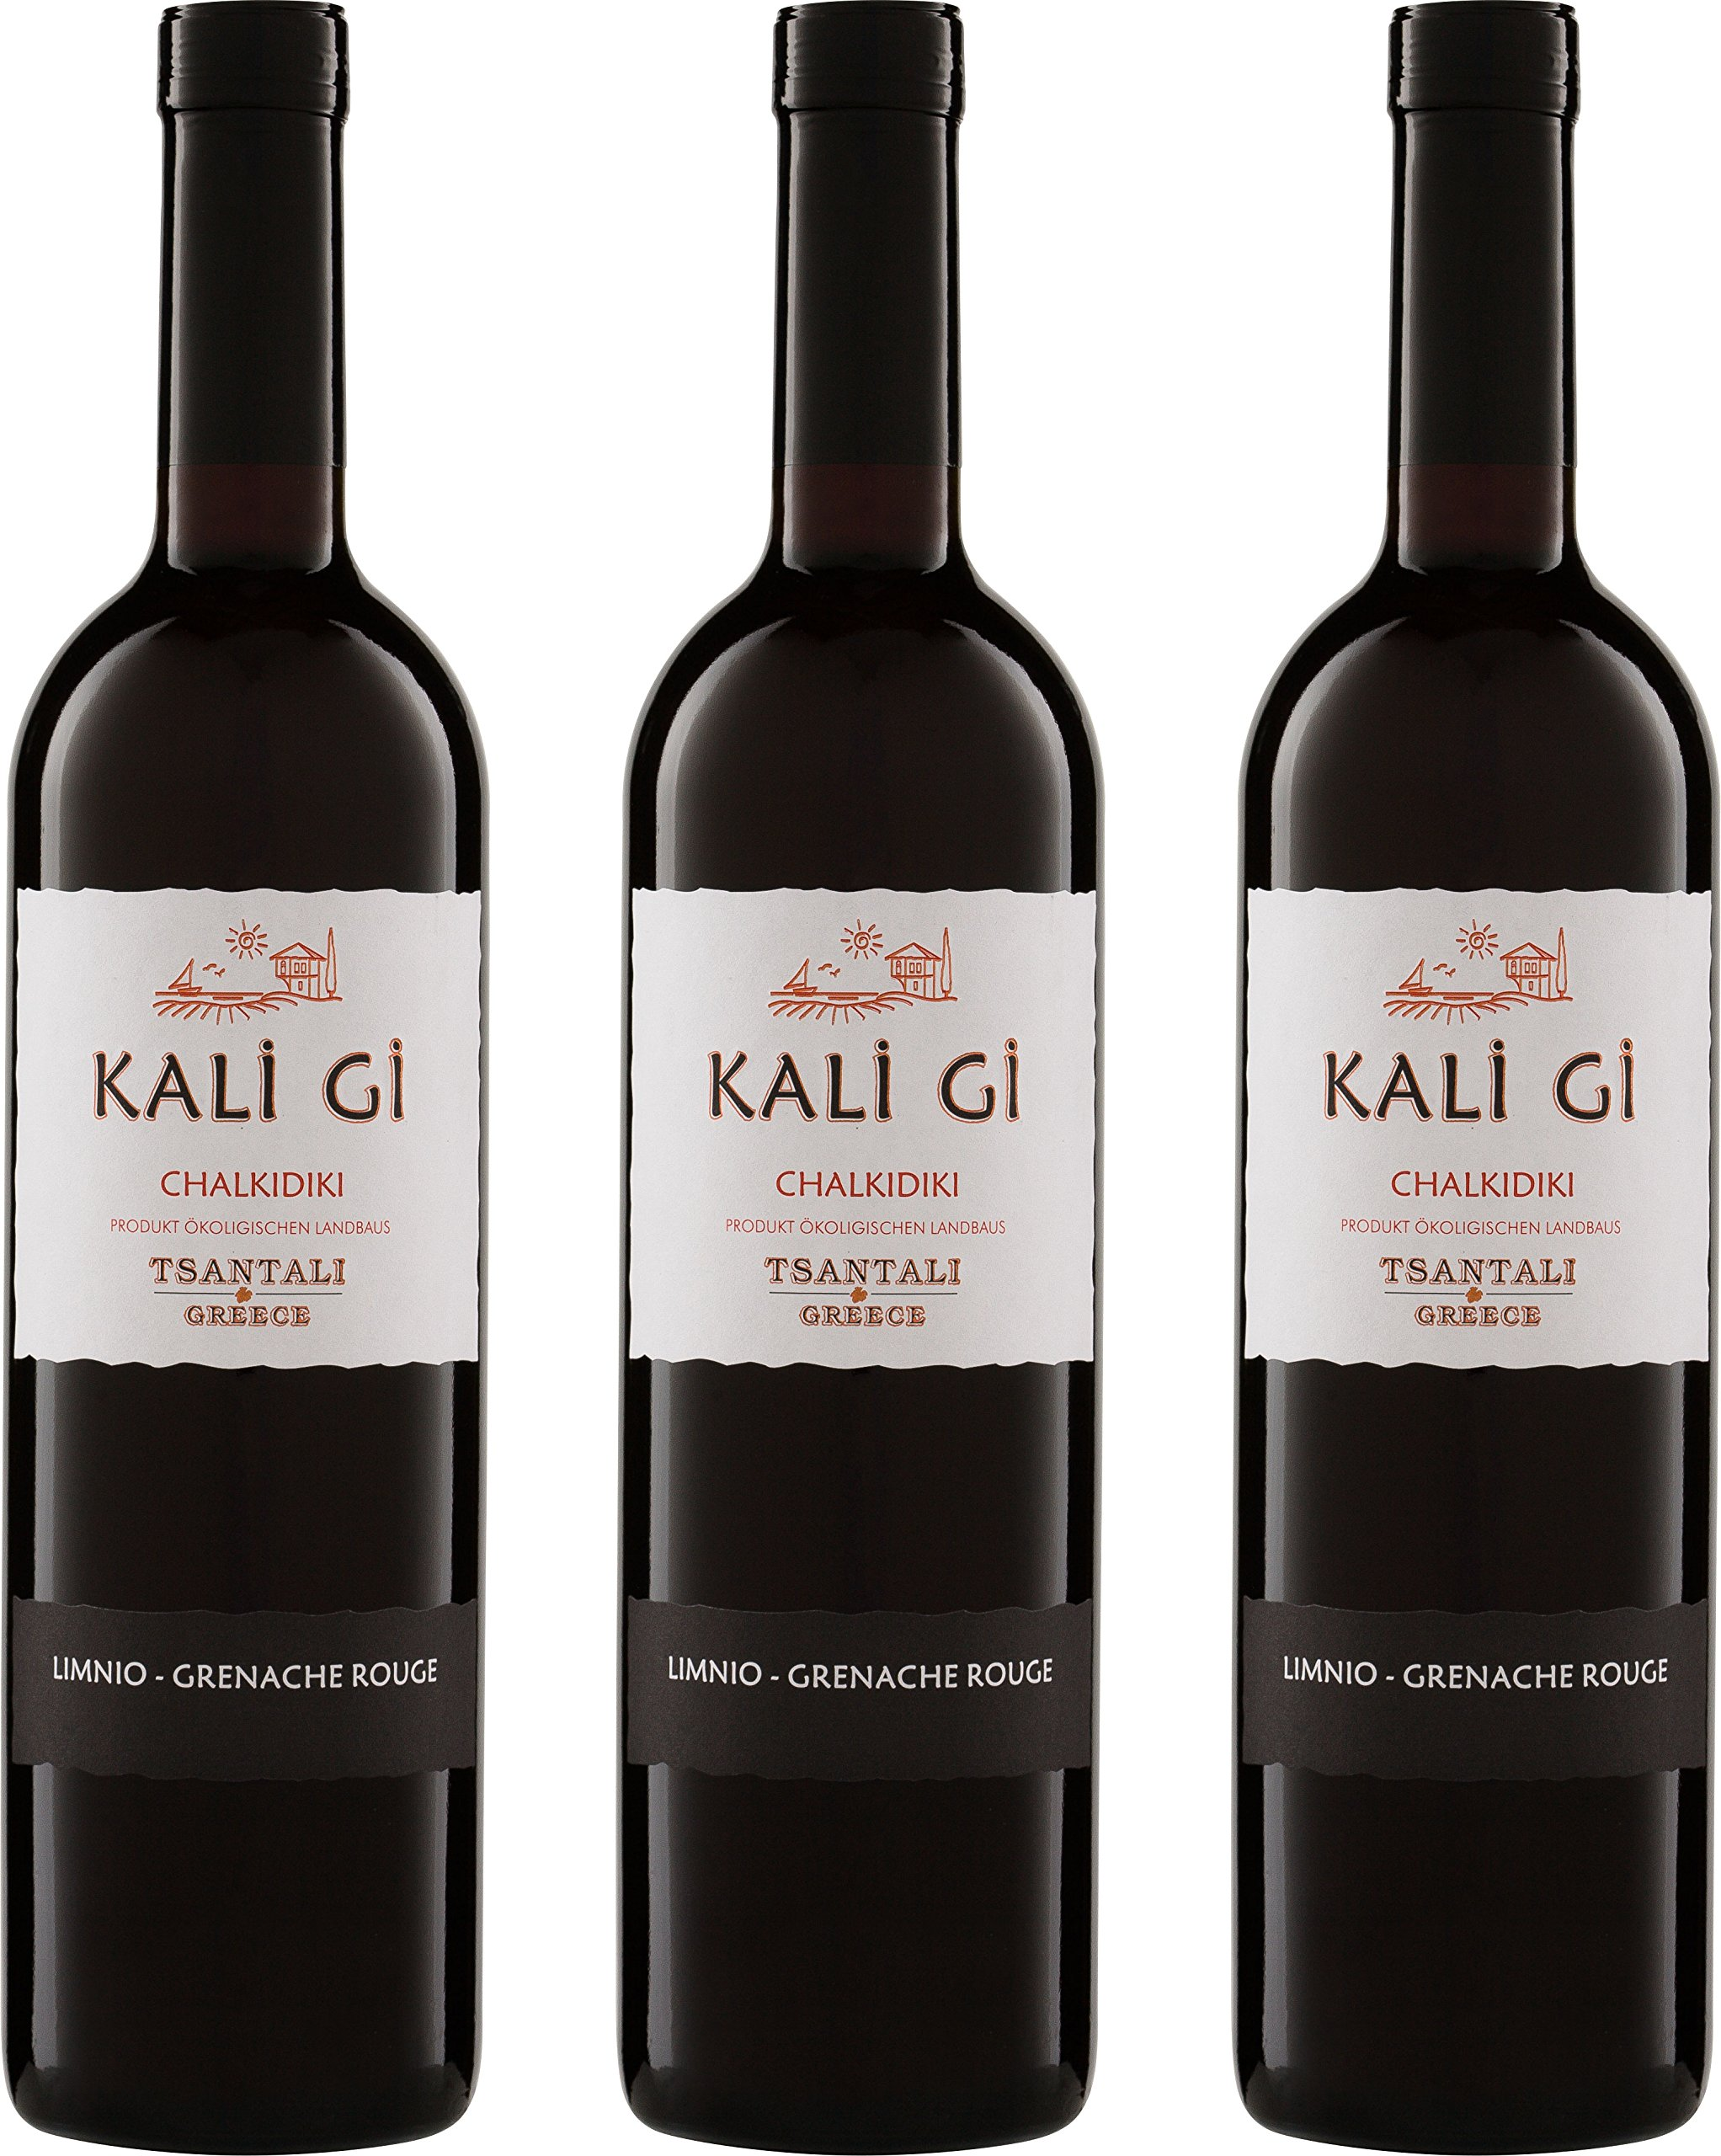 Tsantali-Kali-Gi-Rot-Chalkidiki-ggA-2015-Cuve-Trocken-3-x-075-l